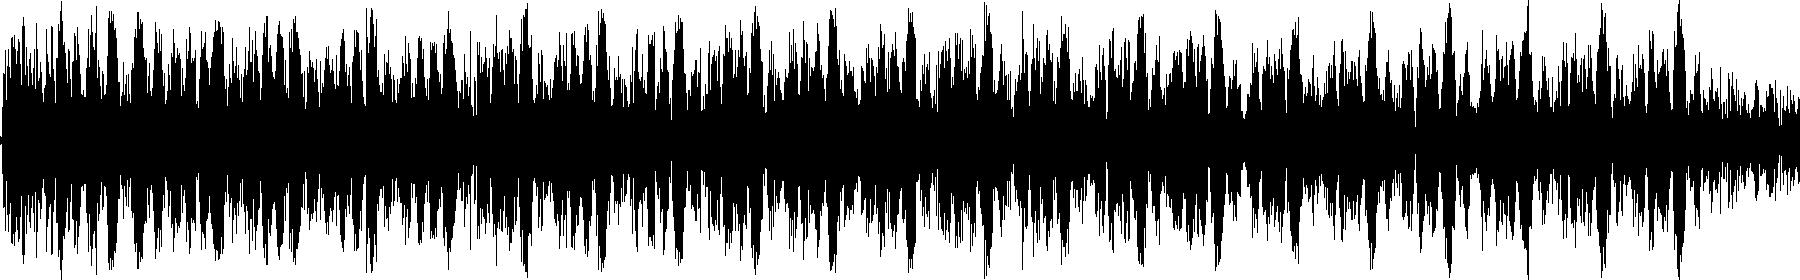 vedh synth cut 076 g